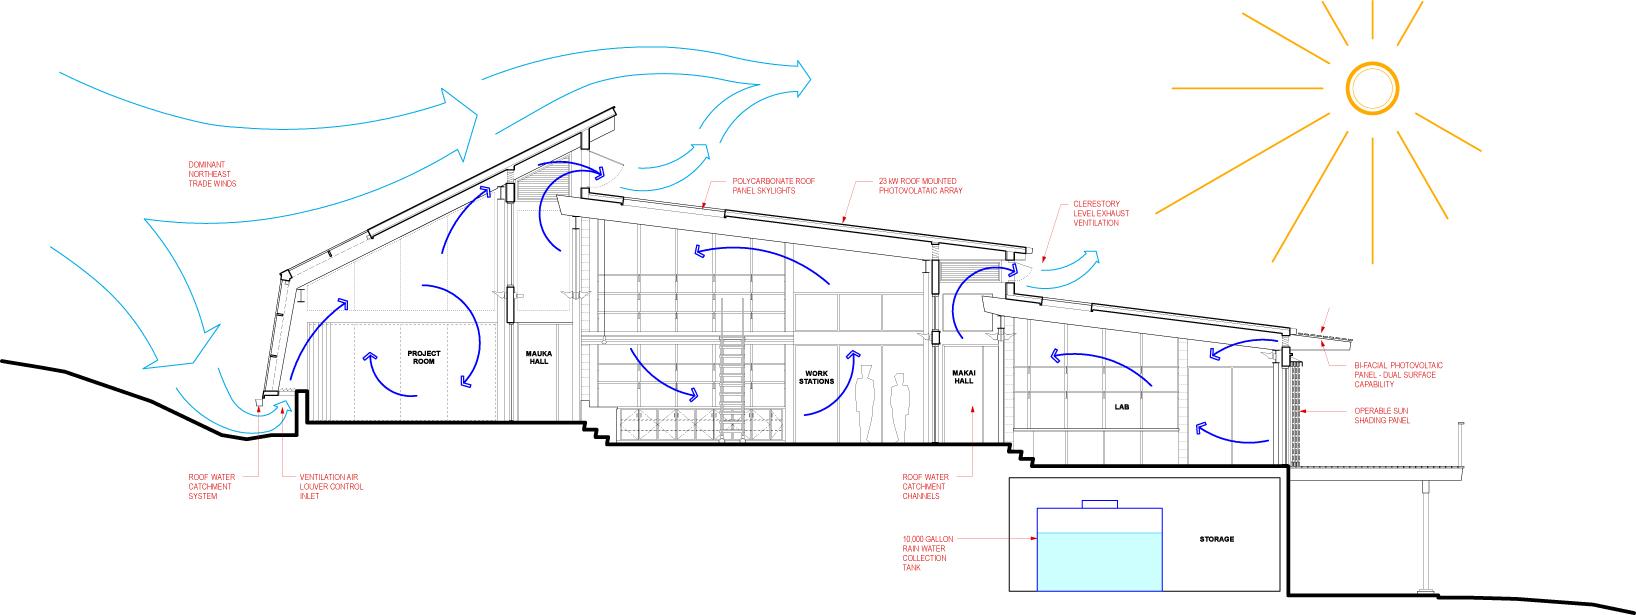 Hawaii preparatory academy energy laboratory flansburgh for Lab architects